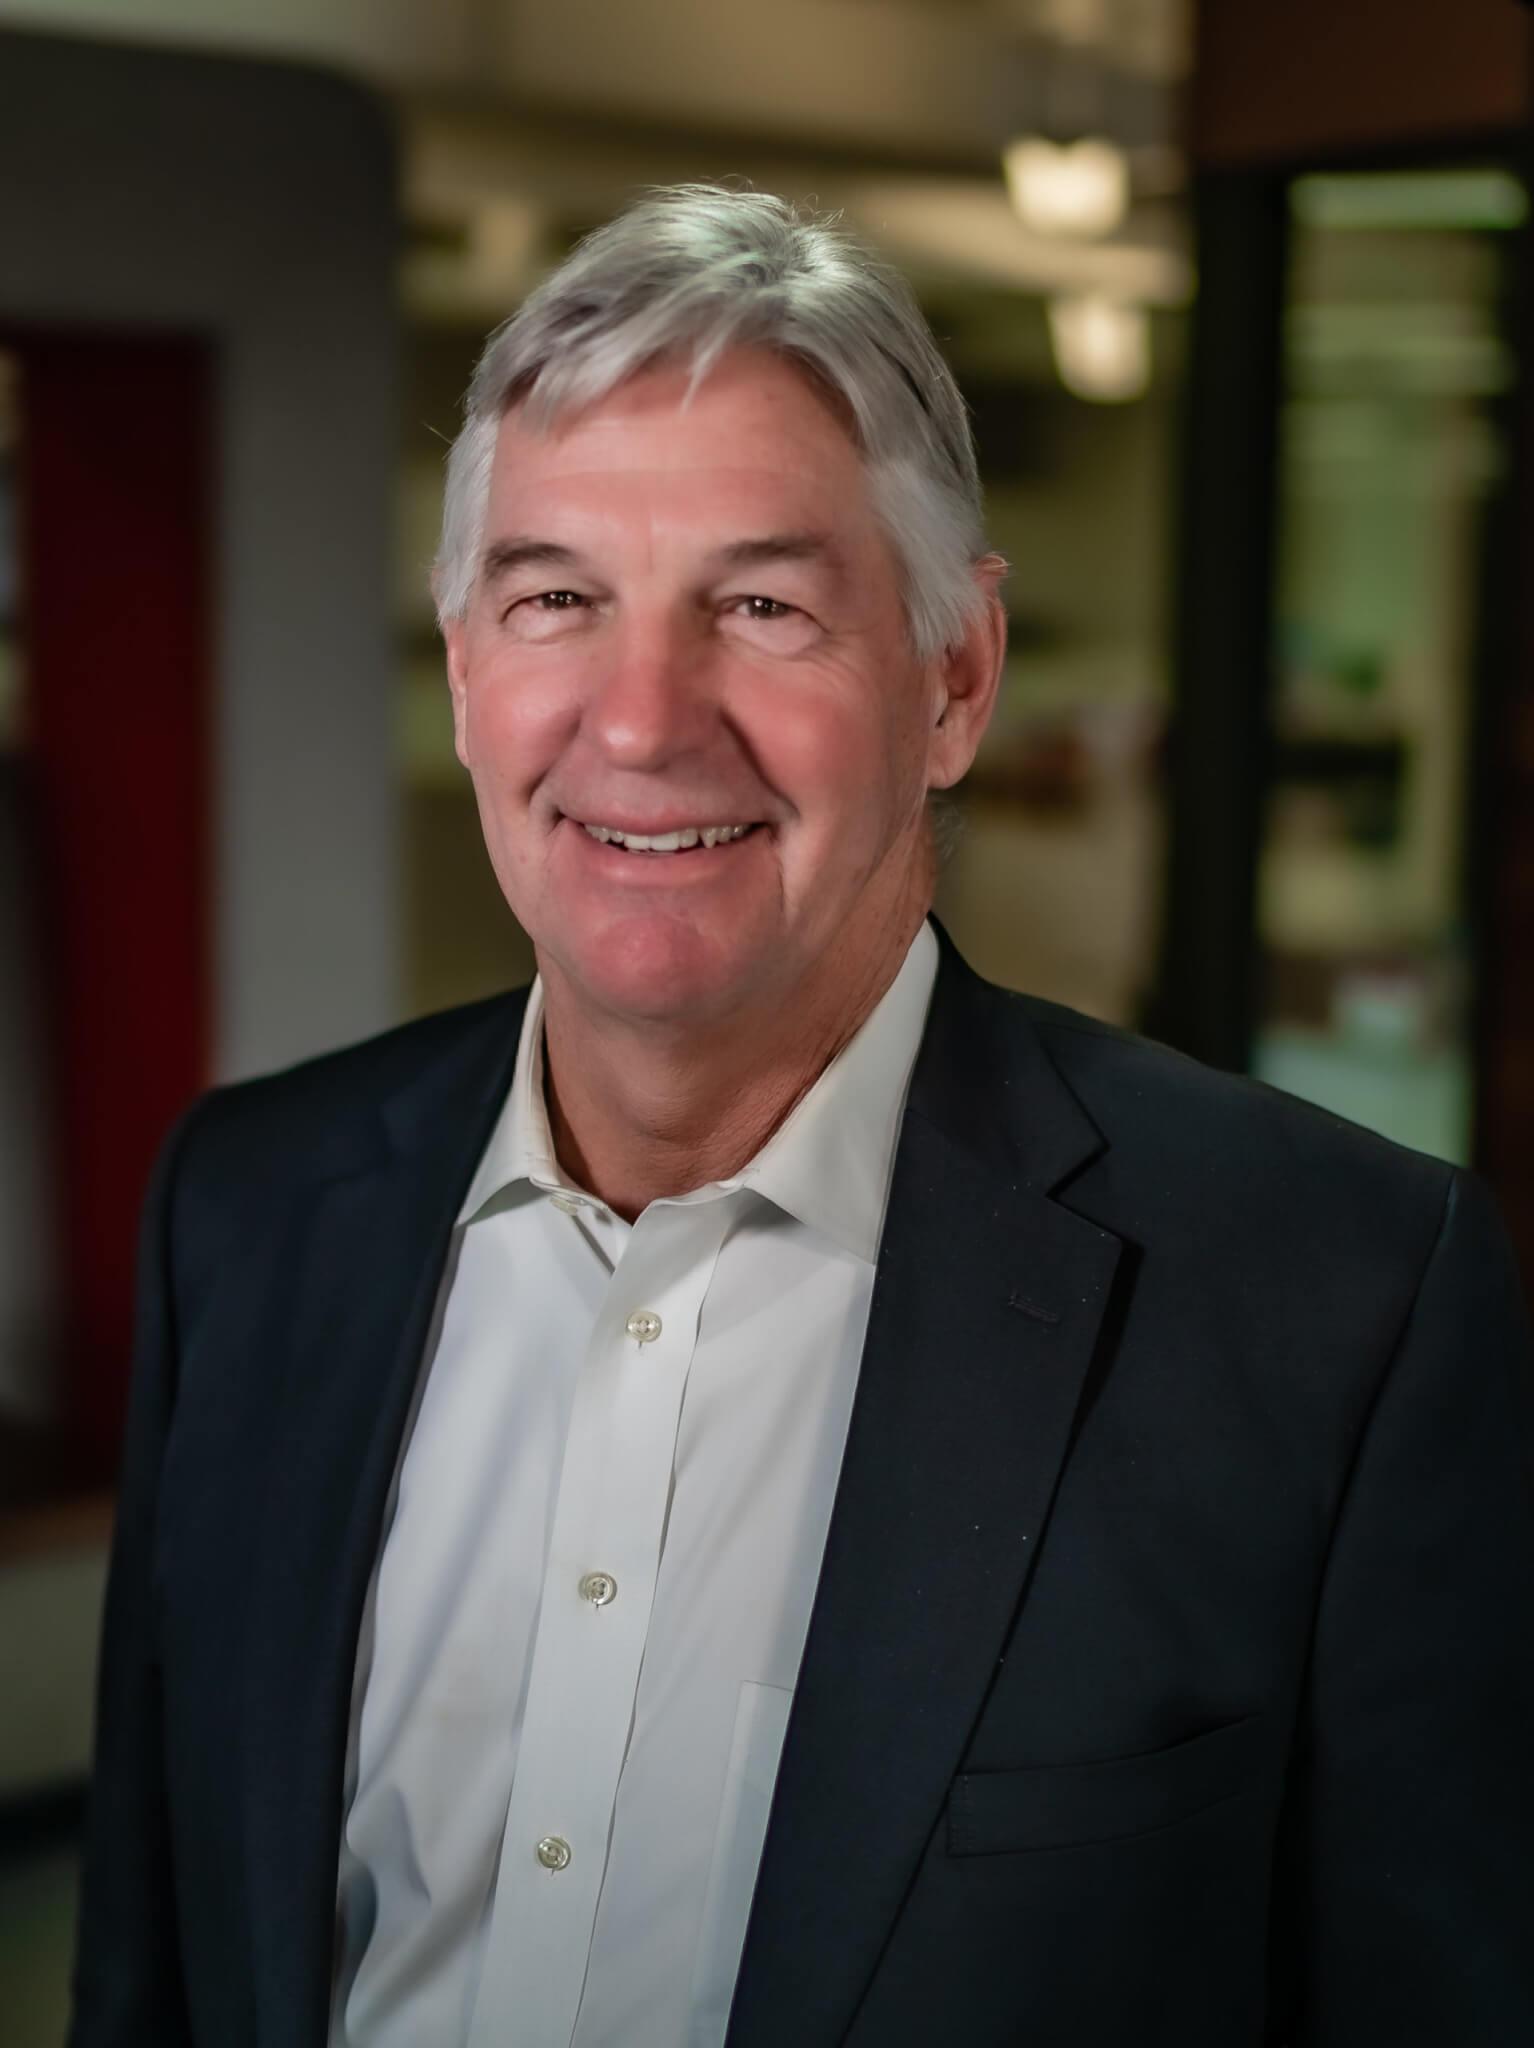 Alan Fish, Associate Vice Chancellor, UW Facilities Planning and Management